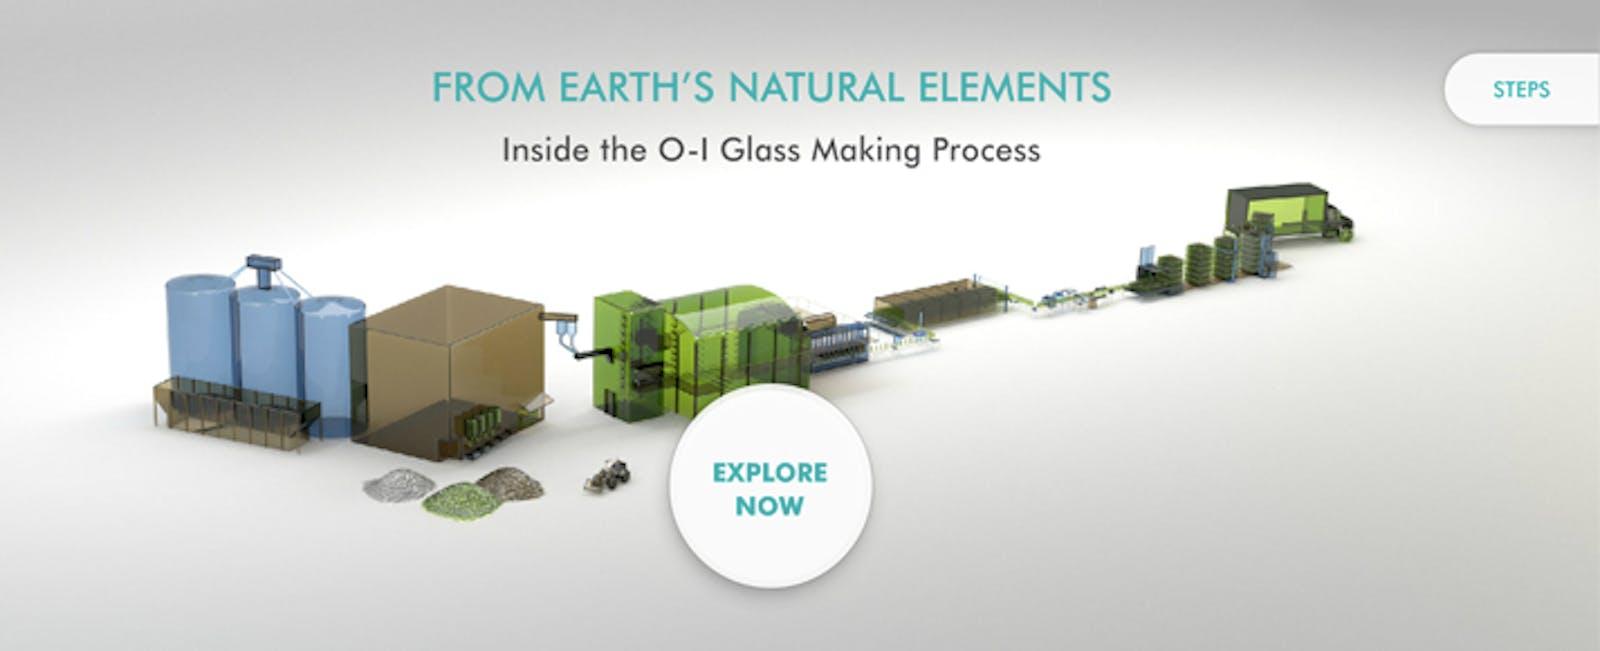 O-I glass making process app